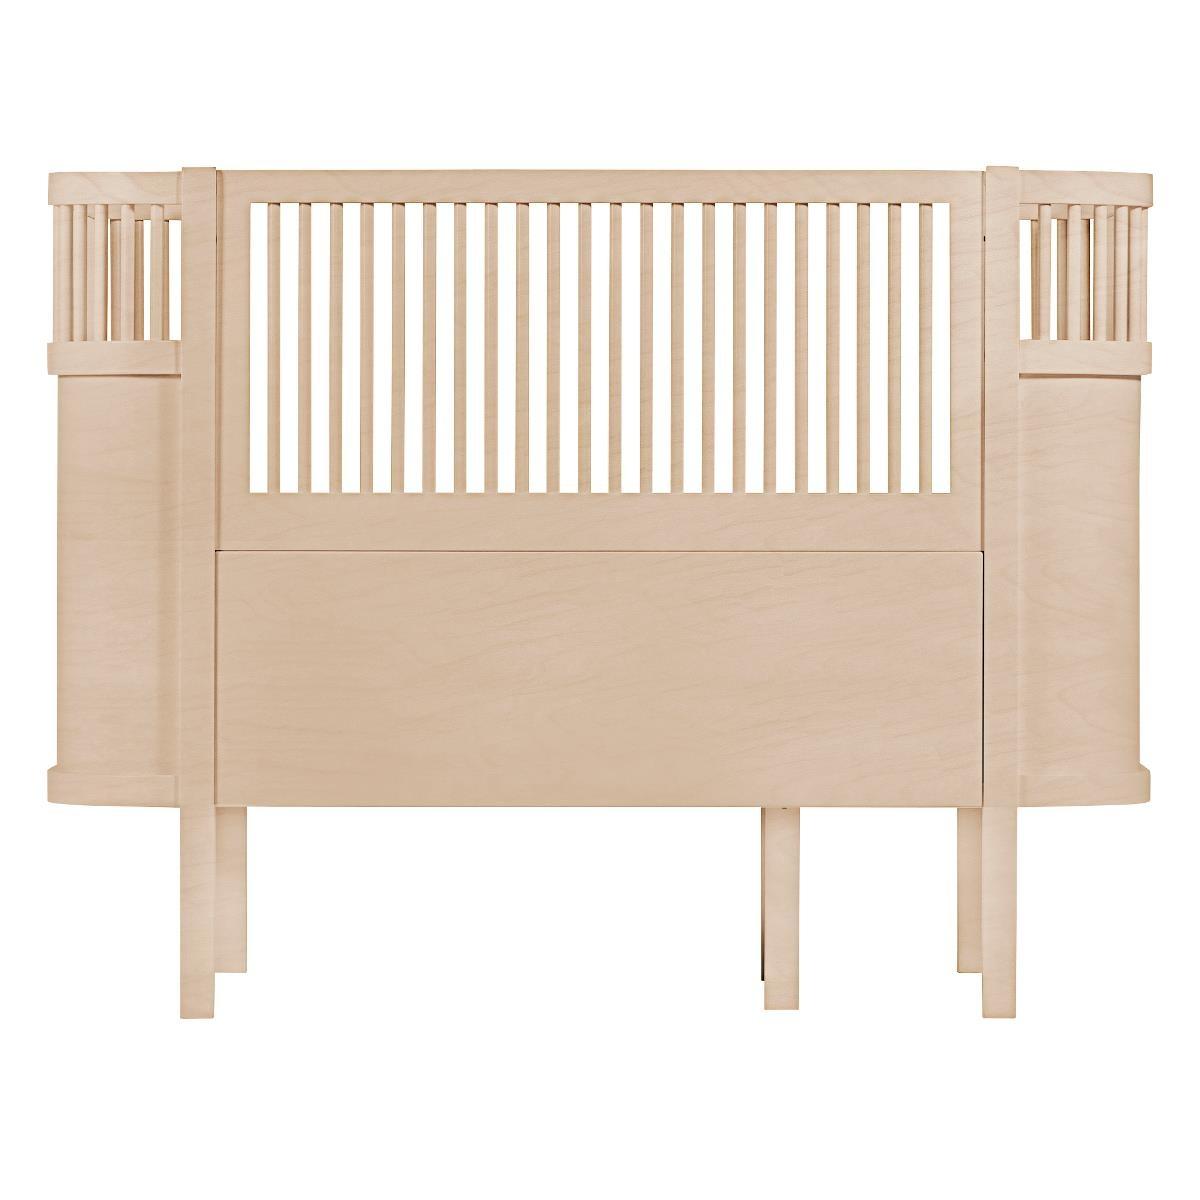 Vanaf Wanneer Kinderbed.The Sebra Bed Baby Jr Wooden Edition Kids With Flair